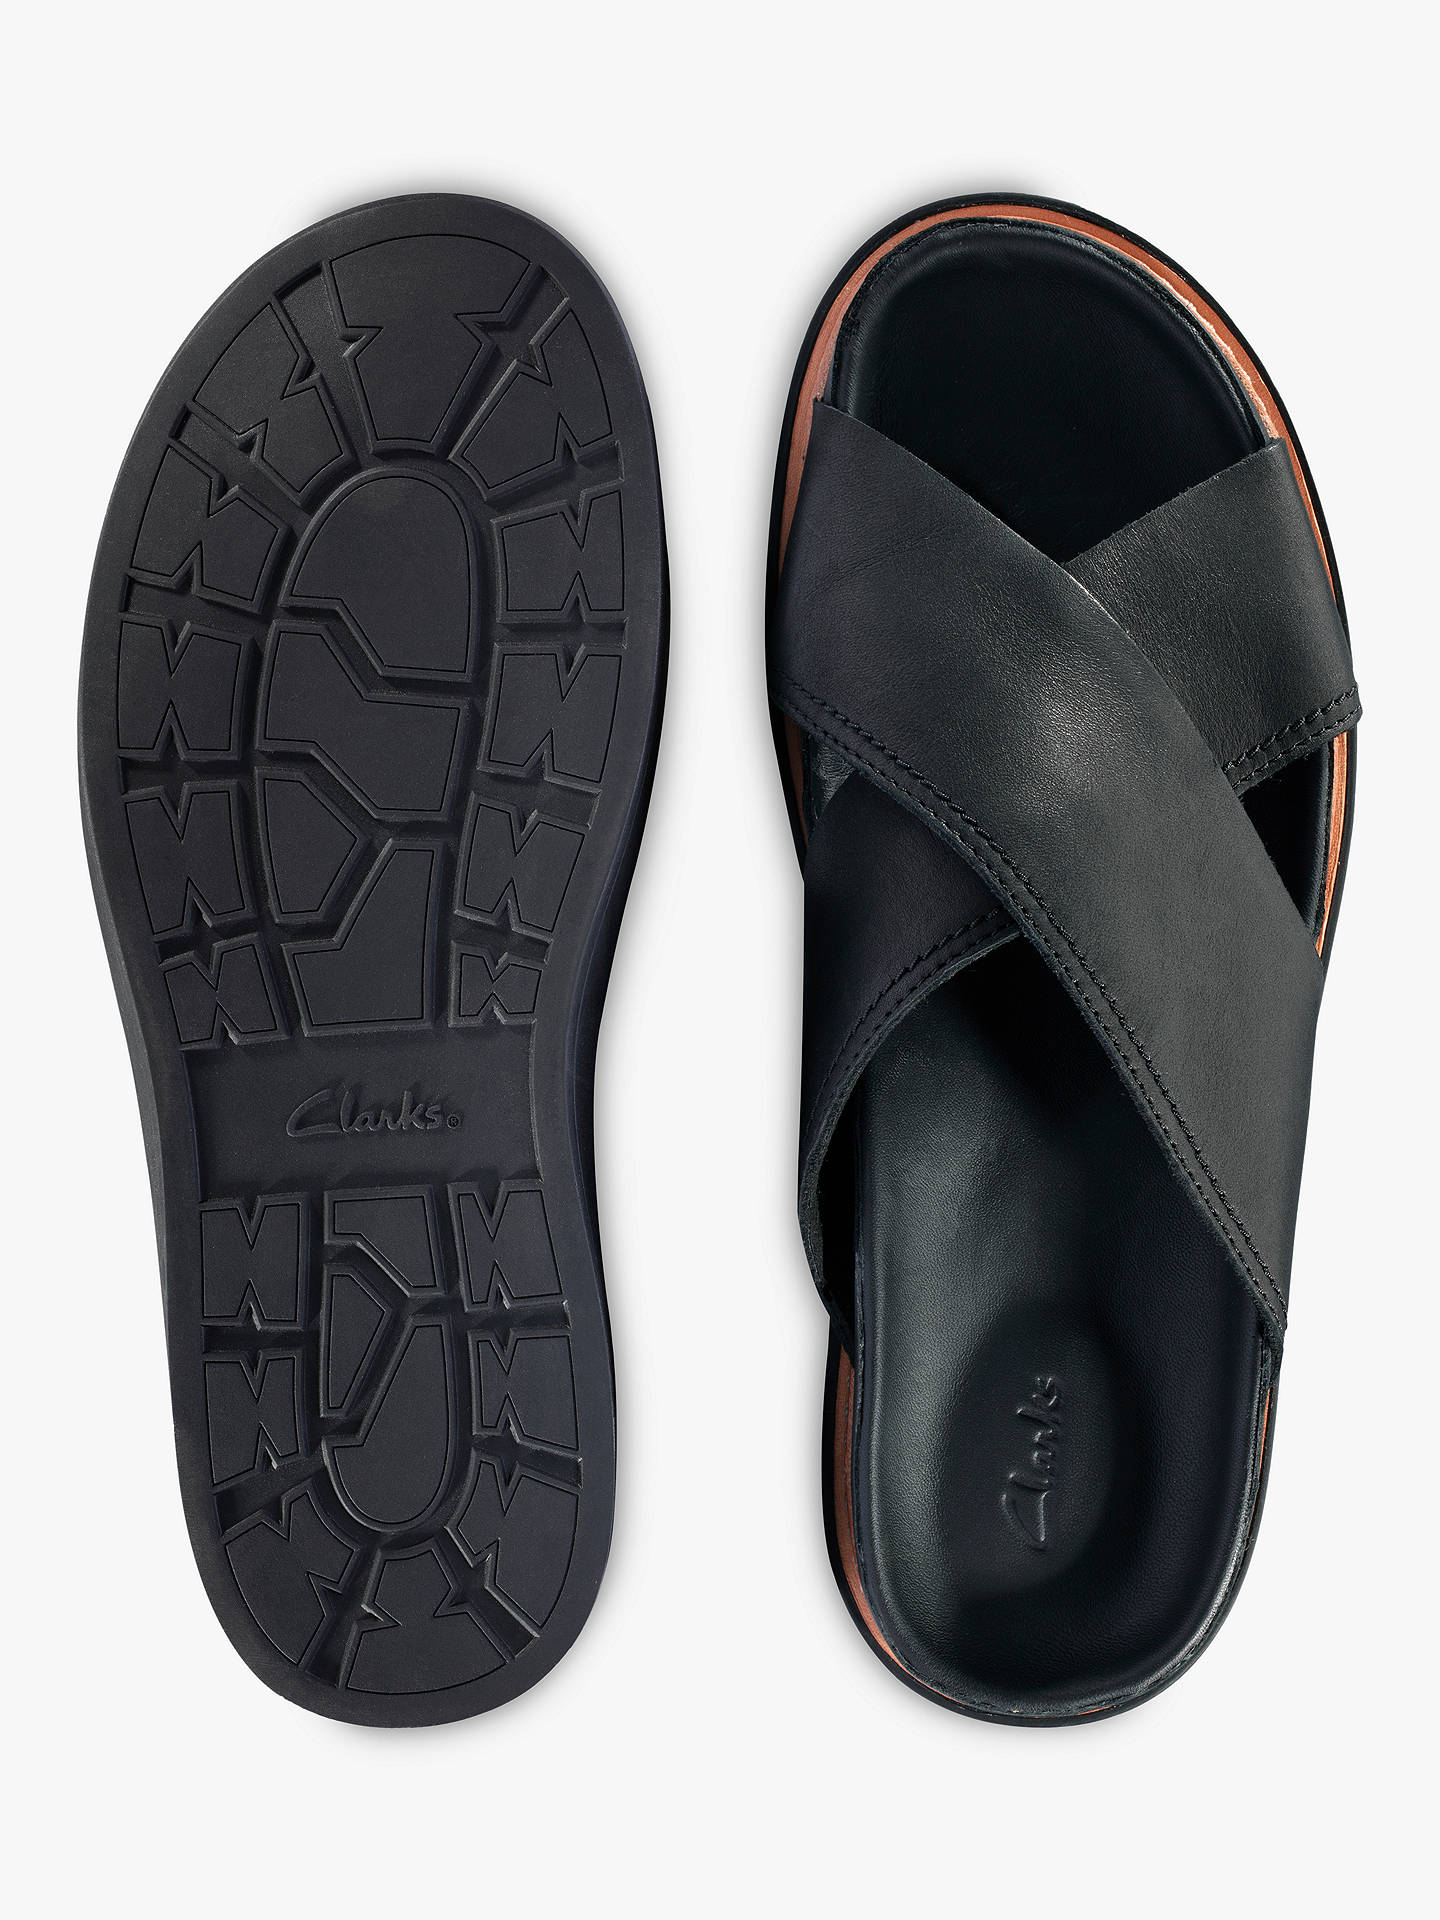 9ccc23b13533 Clarks Trace Drift Sandals at John Lewis   Partners